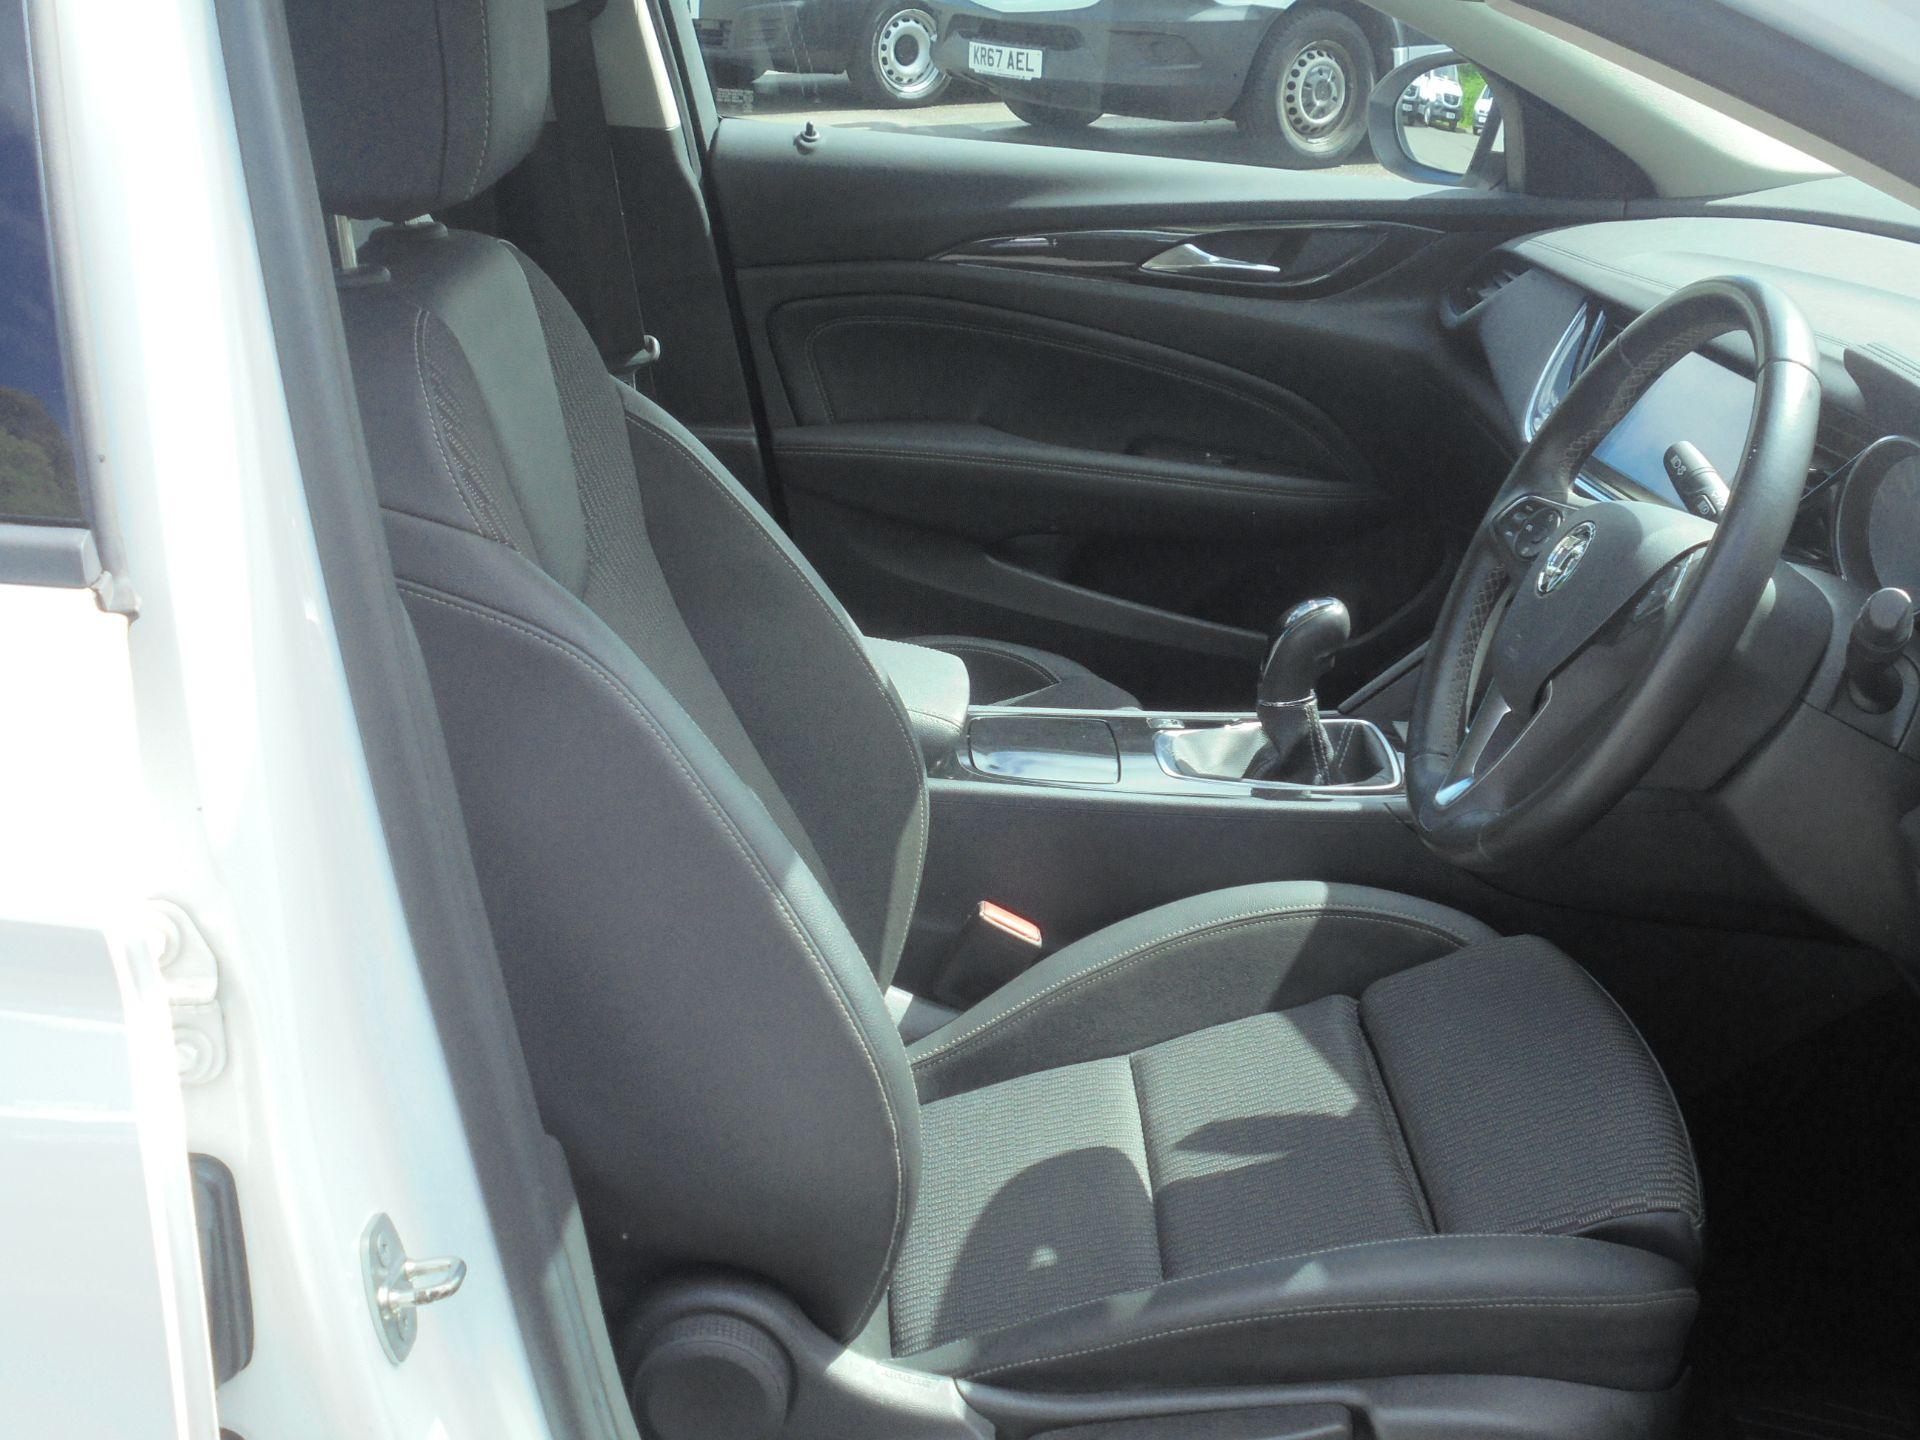 2018 Vauxhall Insignia Grand Sport 1.6 Turbo D Ecotec [136] Sri Nav 5Dr (VU18DFF) Image 12